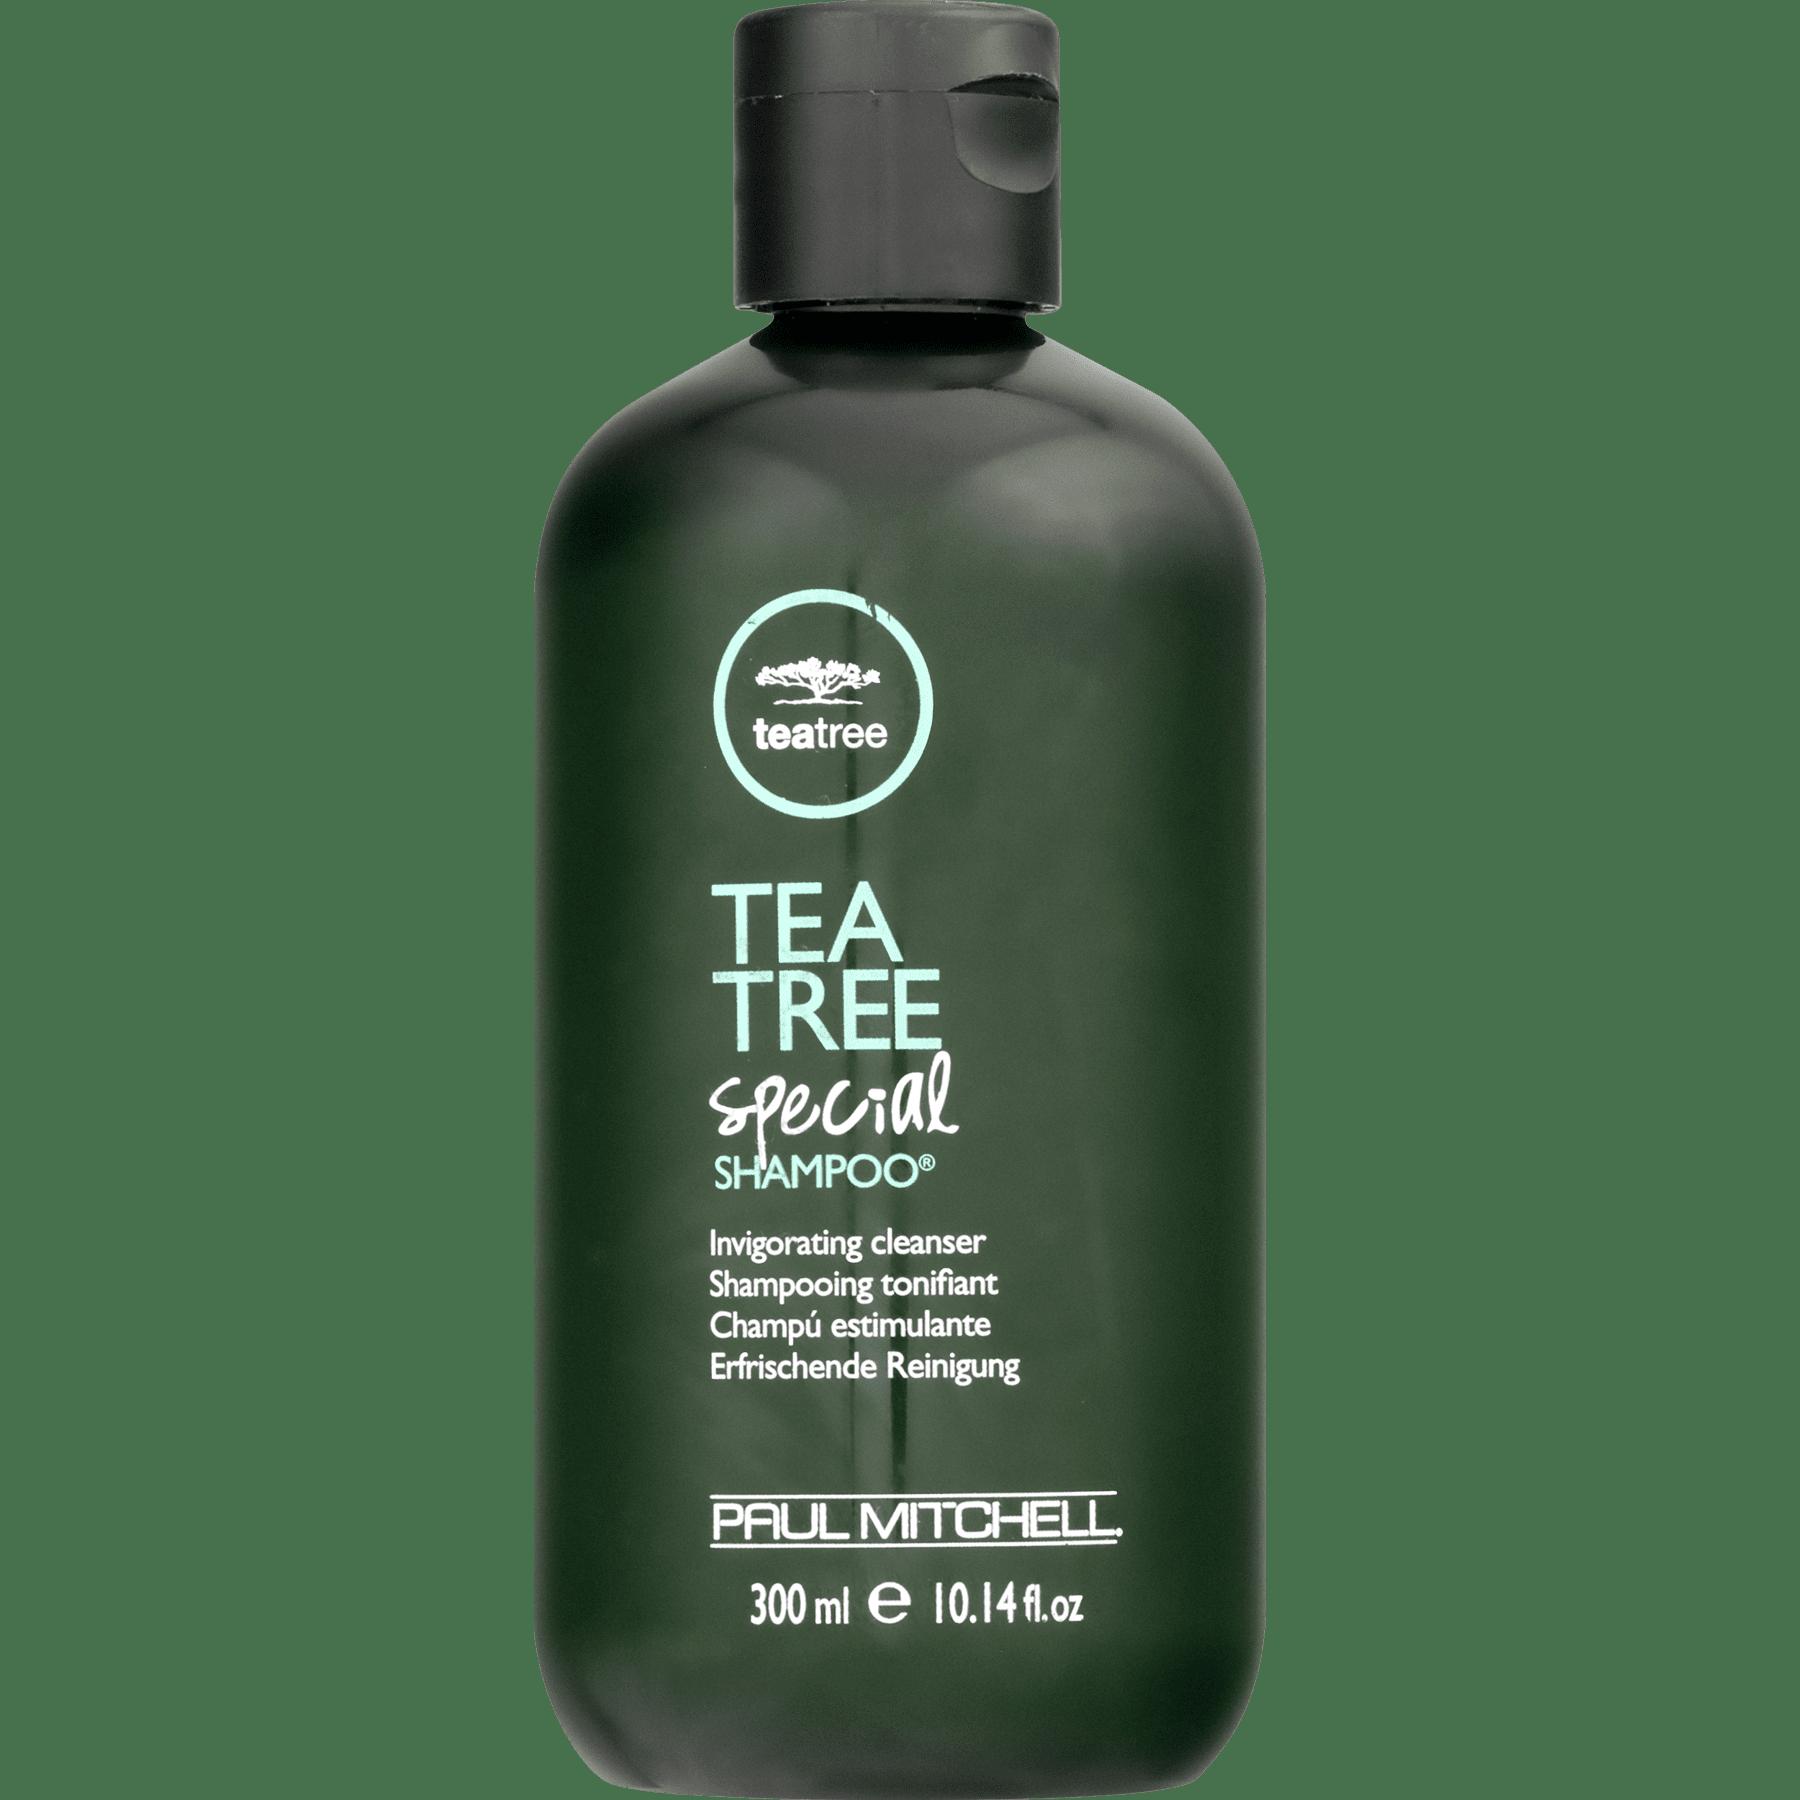 Paul Mitchell Tea Tree Special Shampoo, 10.14 Oz